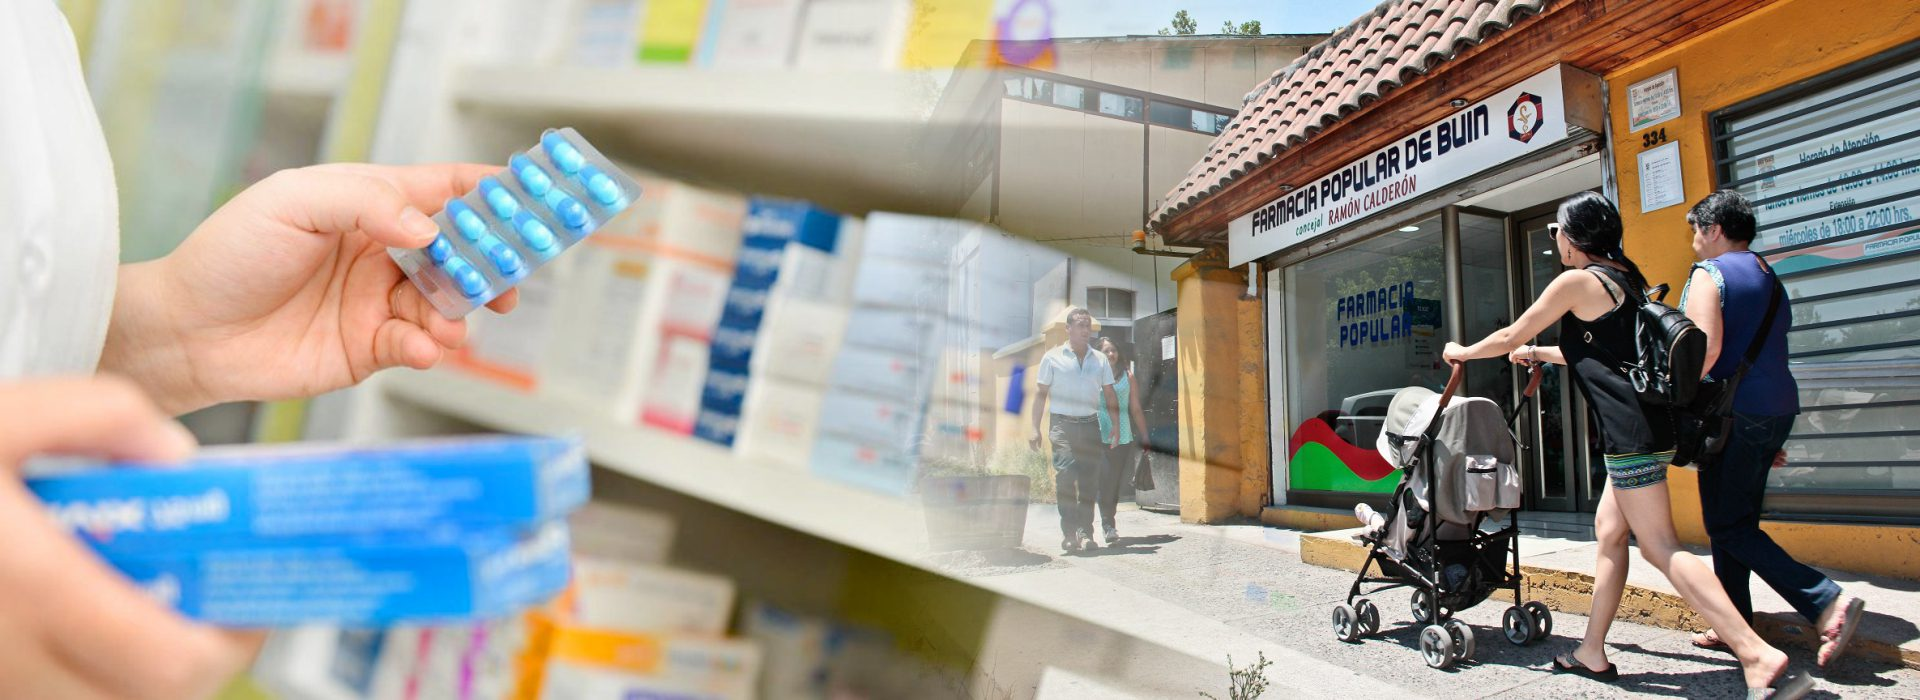 Banner Farmacia Popular